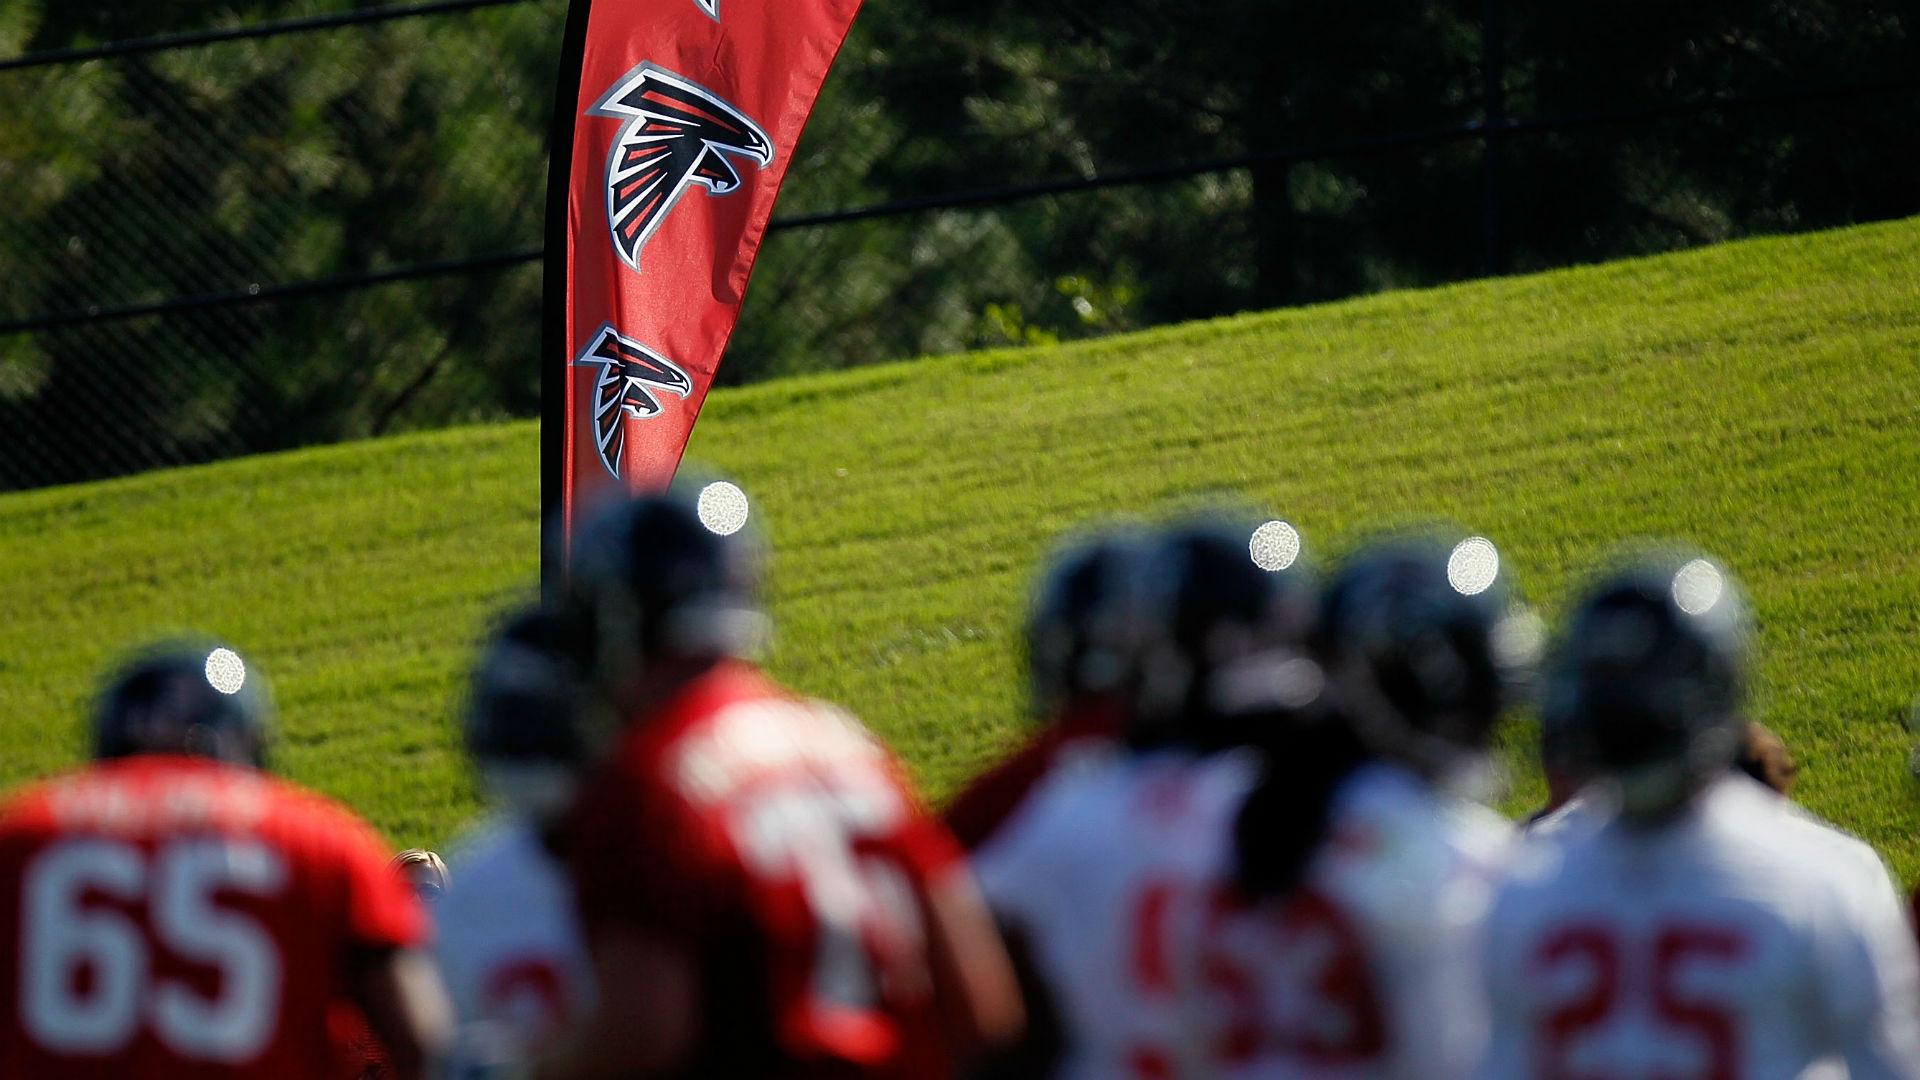 Falcons-training-camp-052517-Getty-FTR.jpg